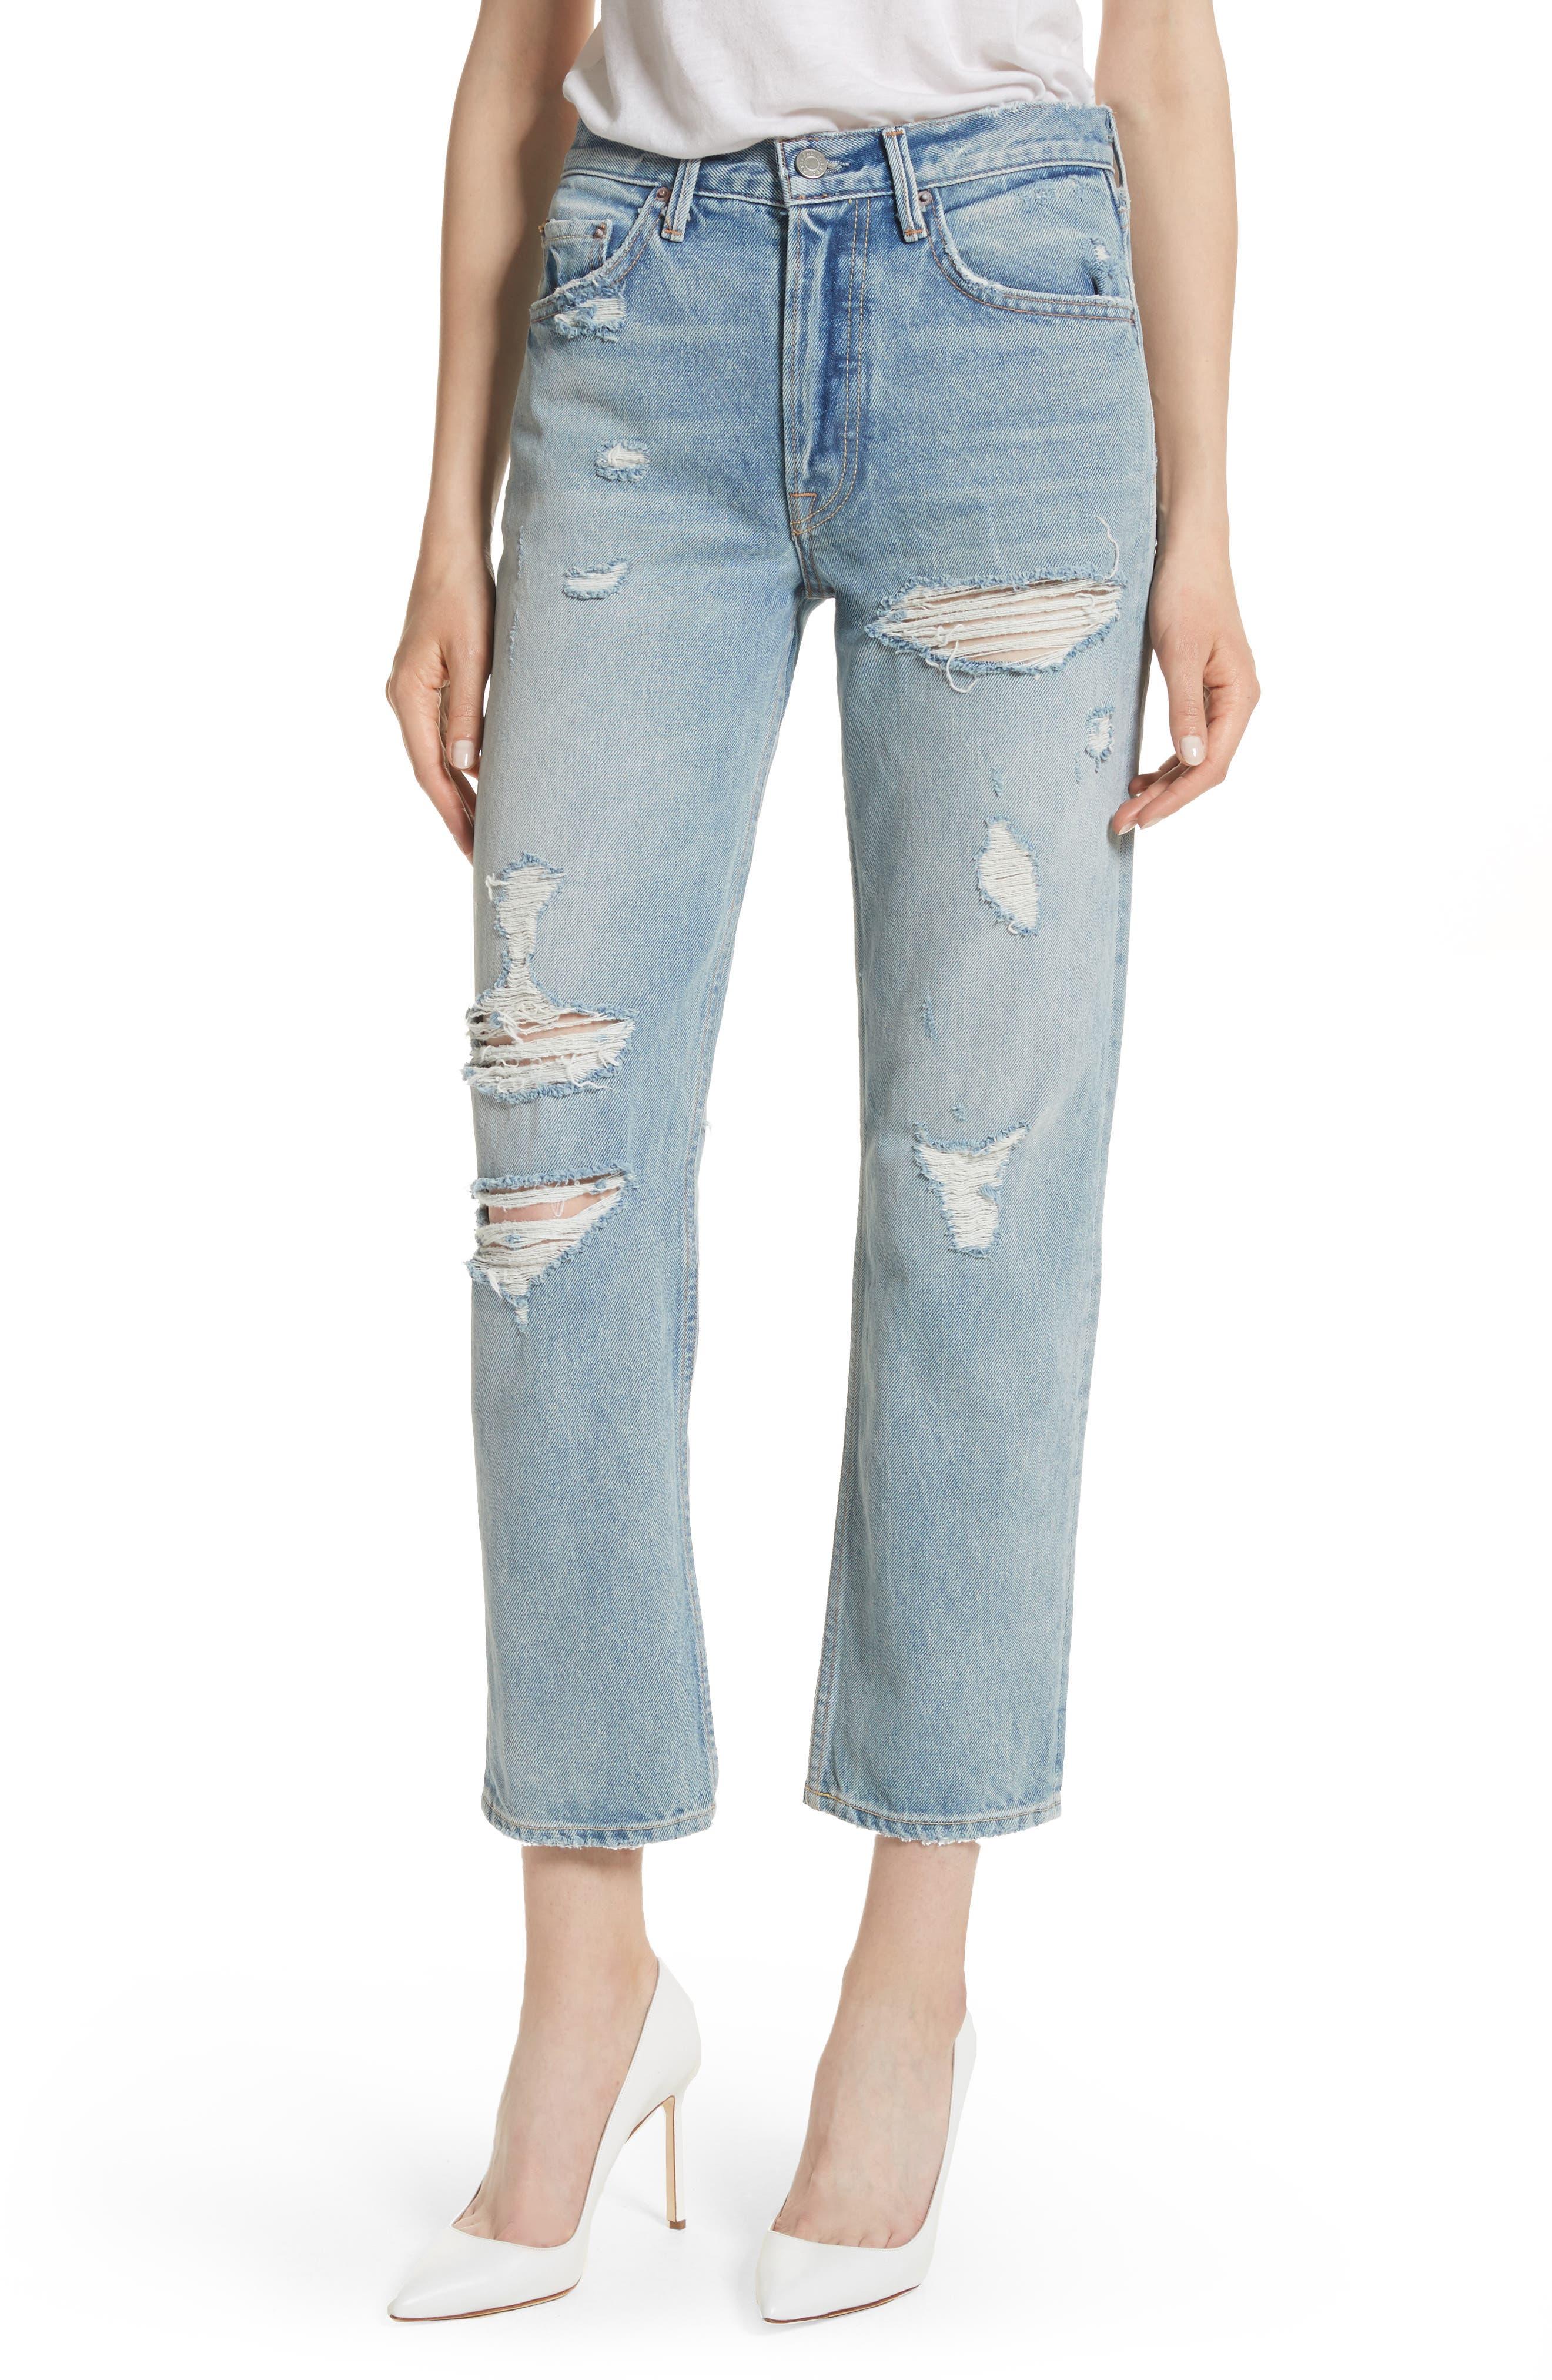 Alternate Image 1 Selected - GRLFRND Helena Ripped Rigid High Waist Straight Jeans (Reese)